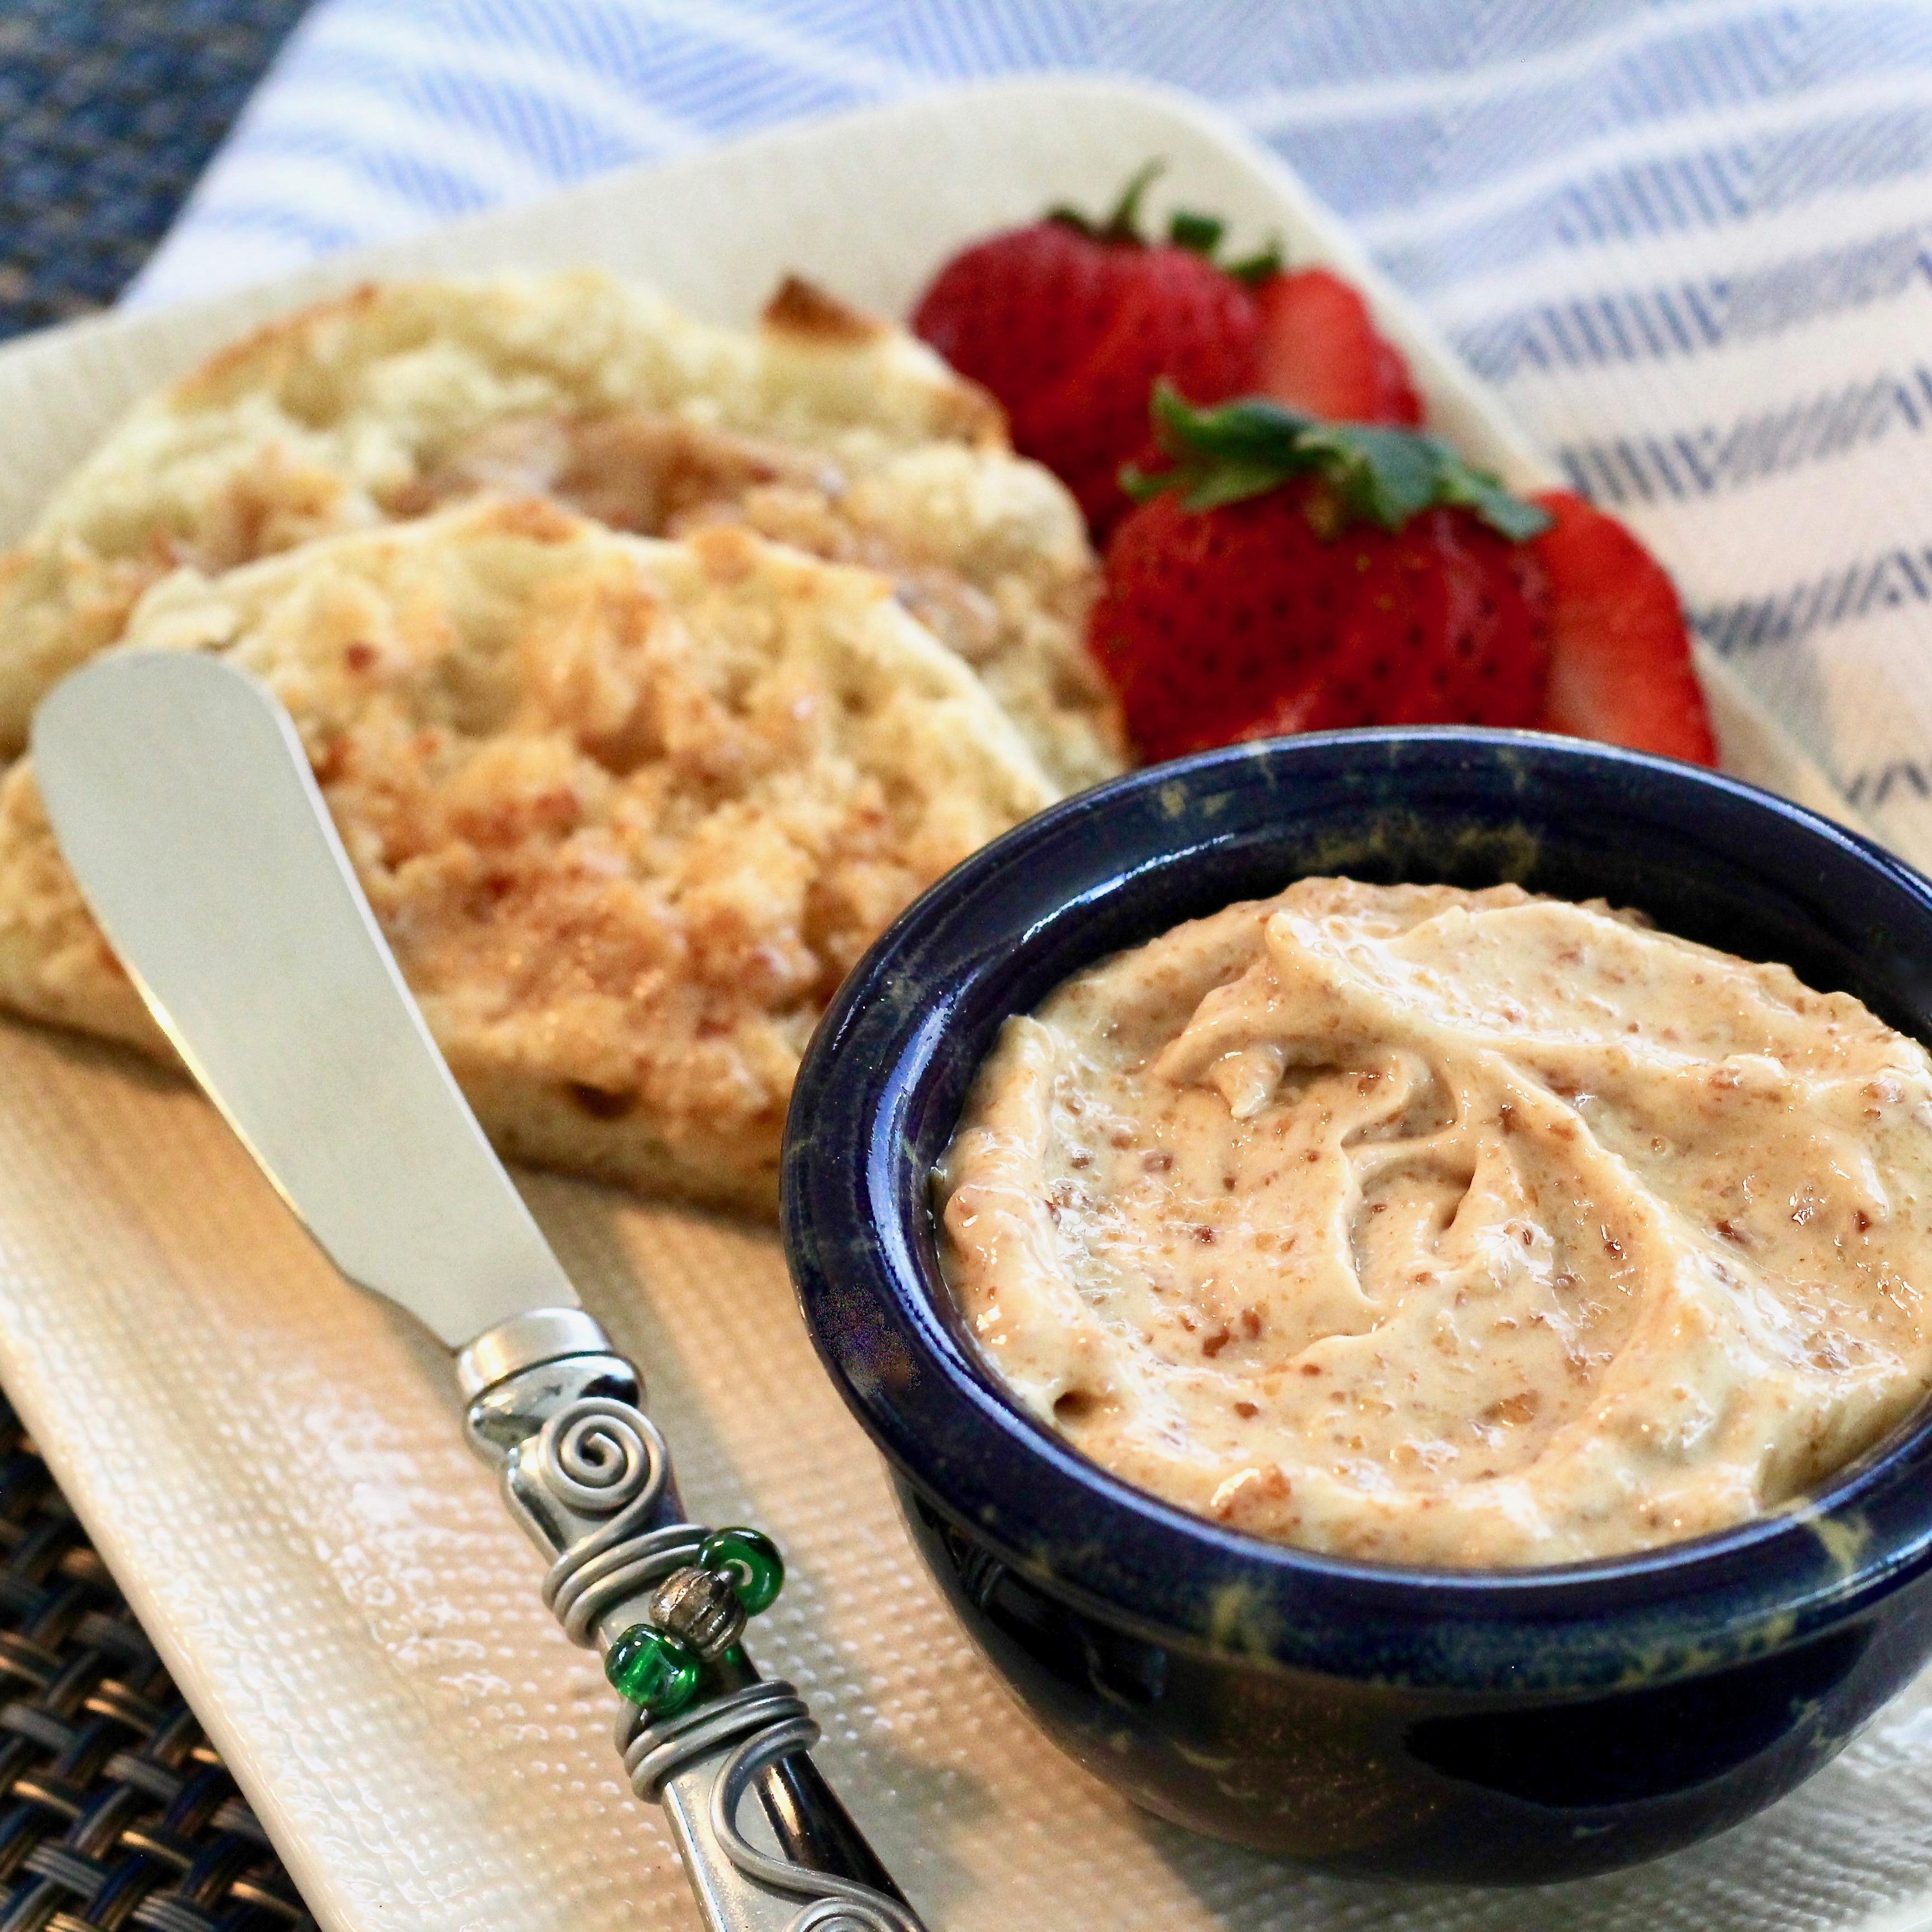 Macadamia Nut Butter